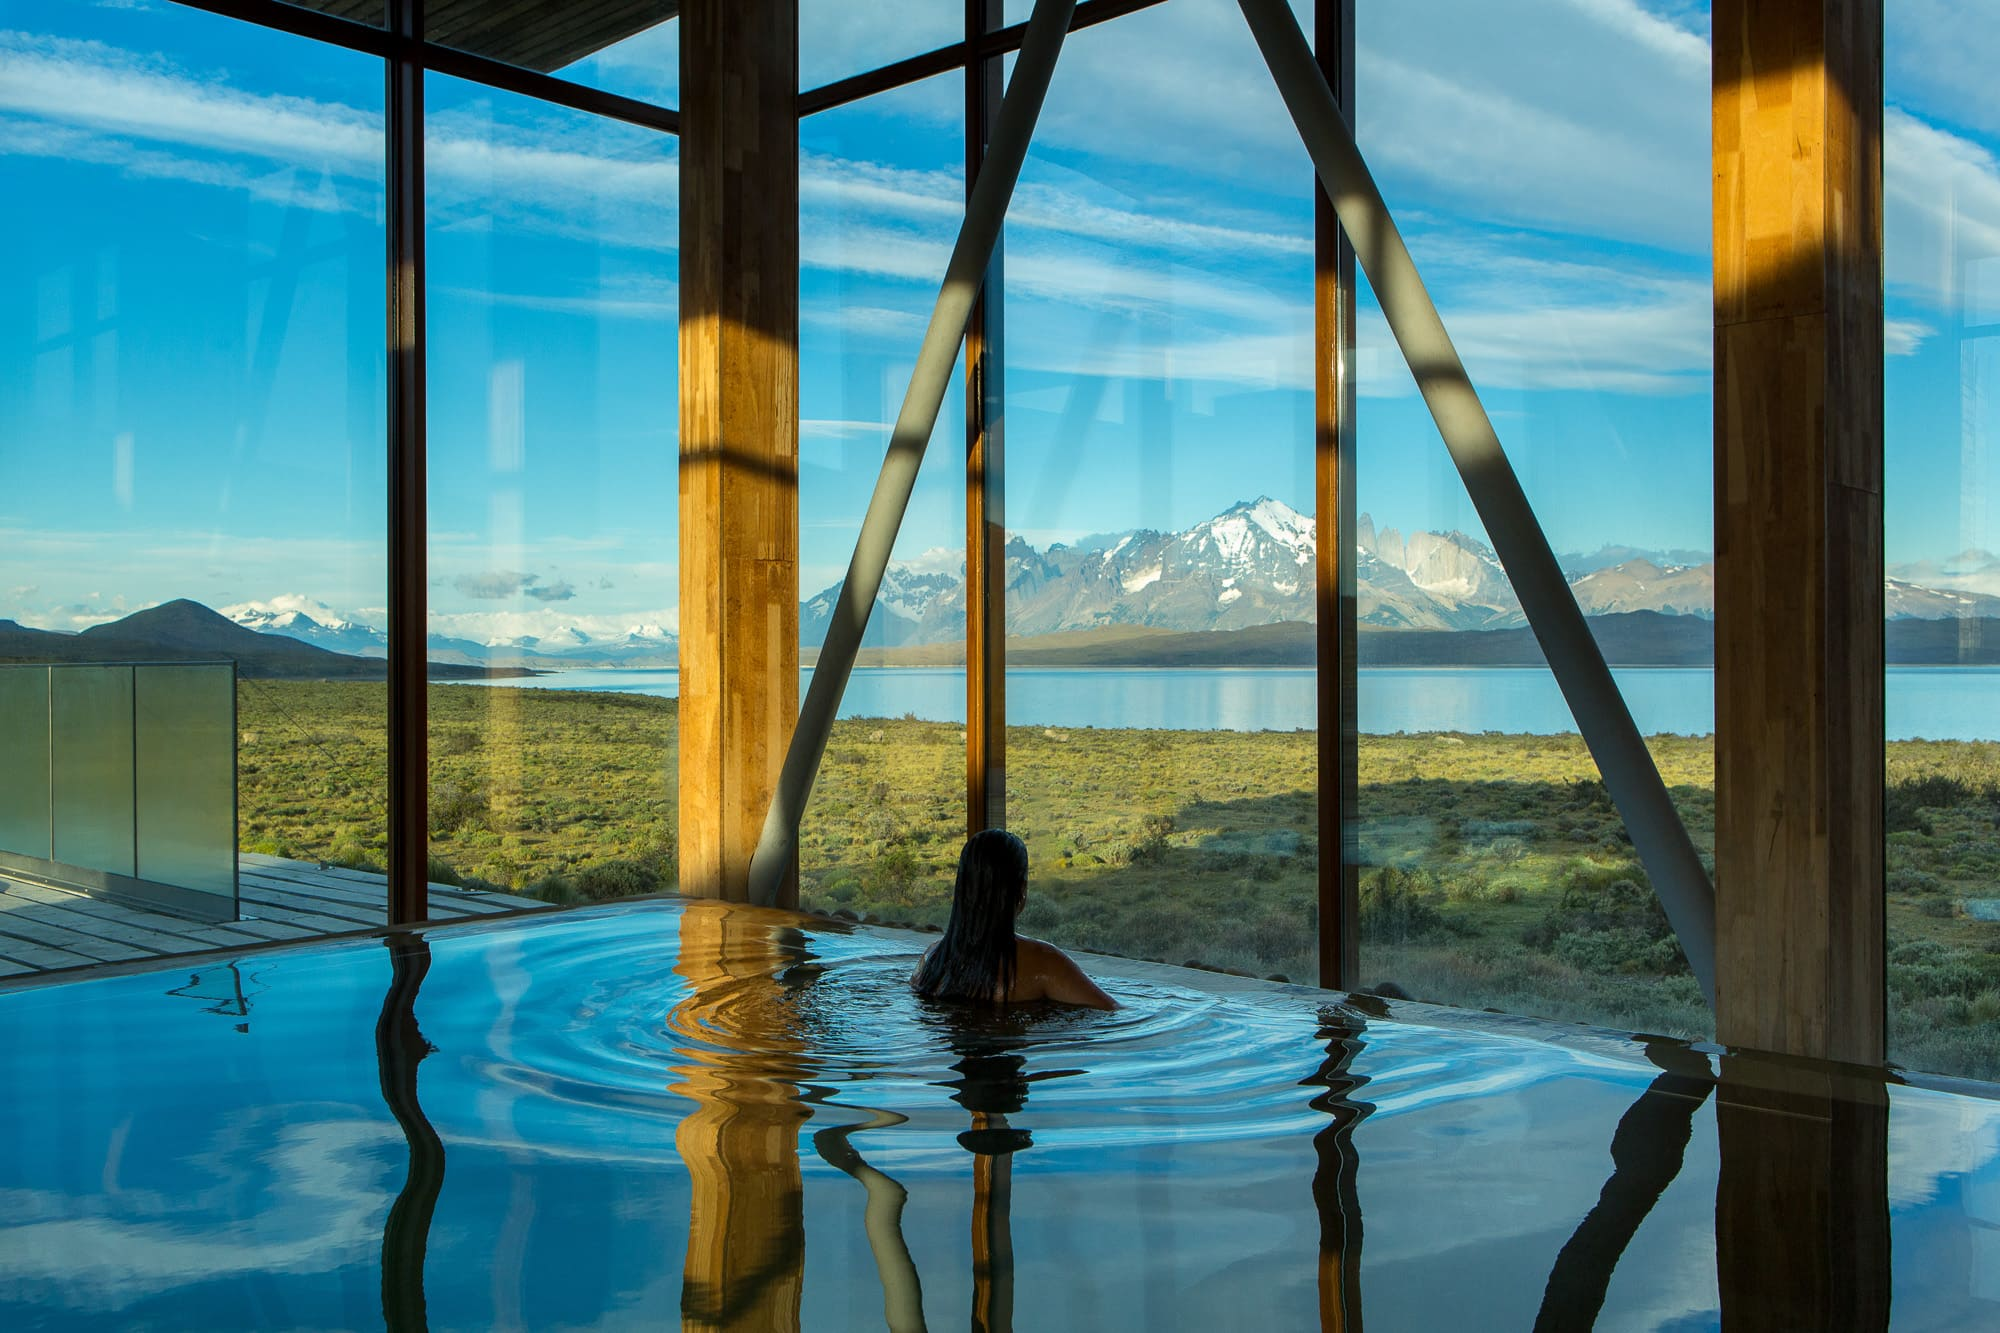 Luxury Eco-Hotel Teirra Patagonia